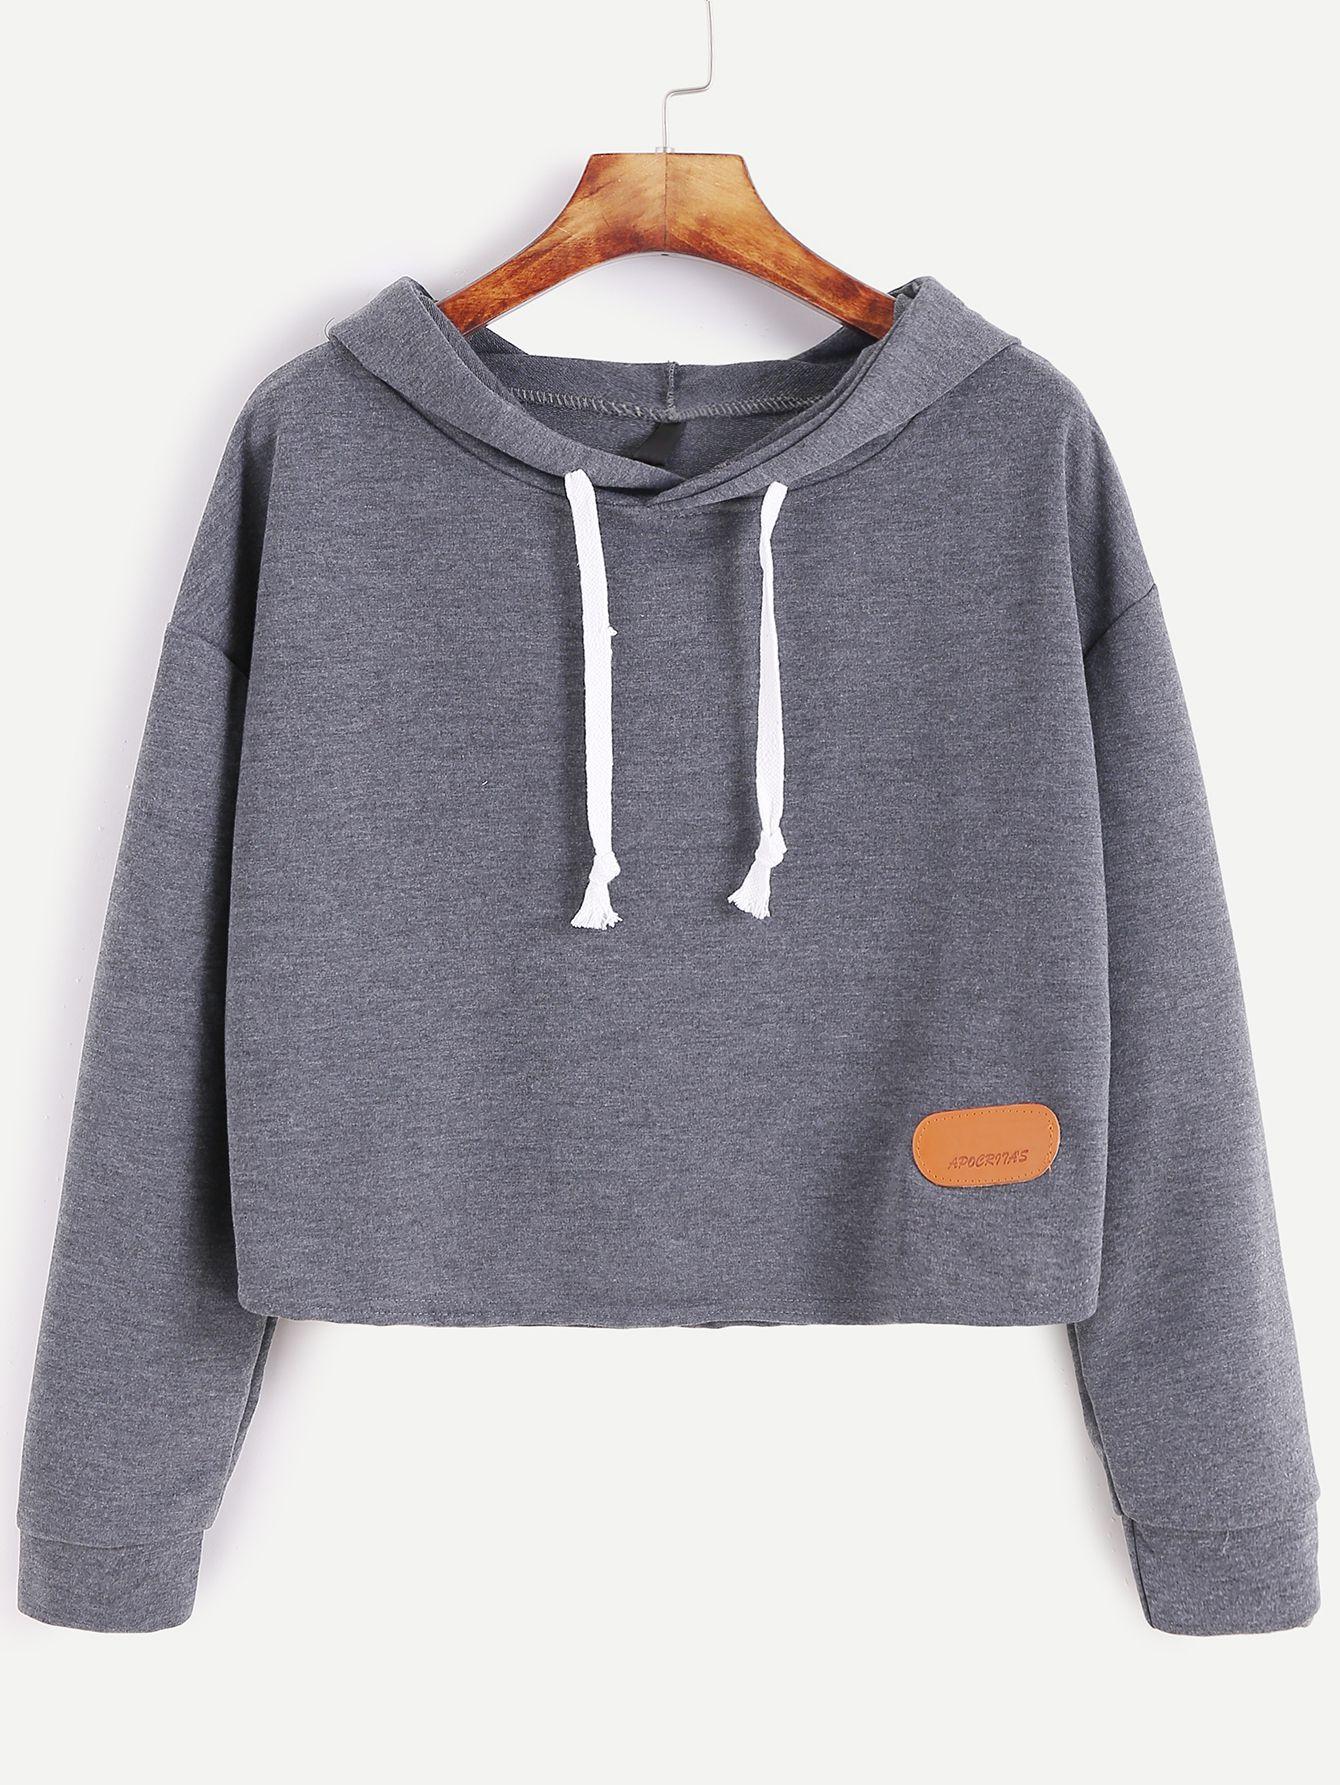 557de306052b Shop Dark Grey Hooded Drop Shoulder Patch Sweatshirt online. SheIn offers  Dark Grey Hooded Drop Shoulder Patch Sweatshirt   more to fit your  fashionable ...